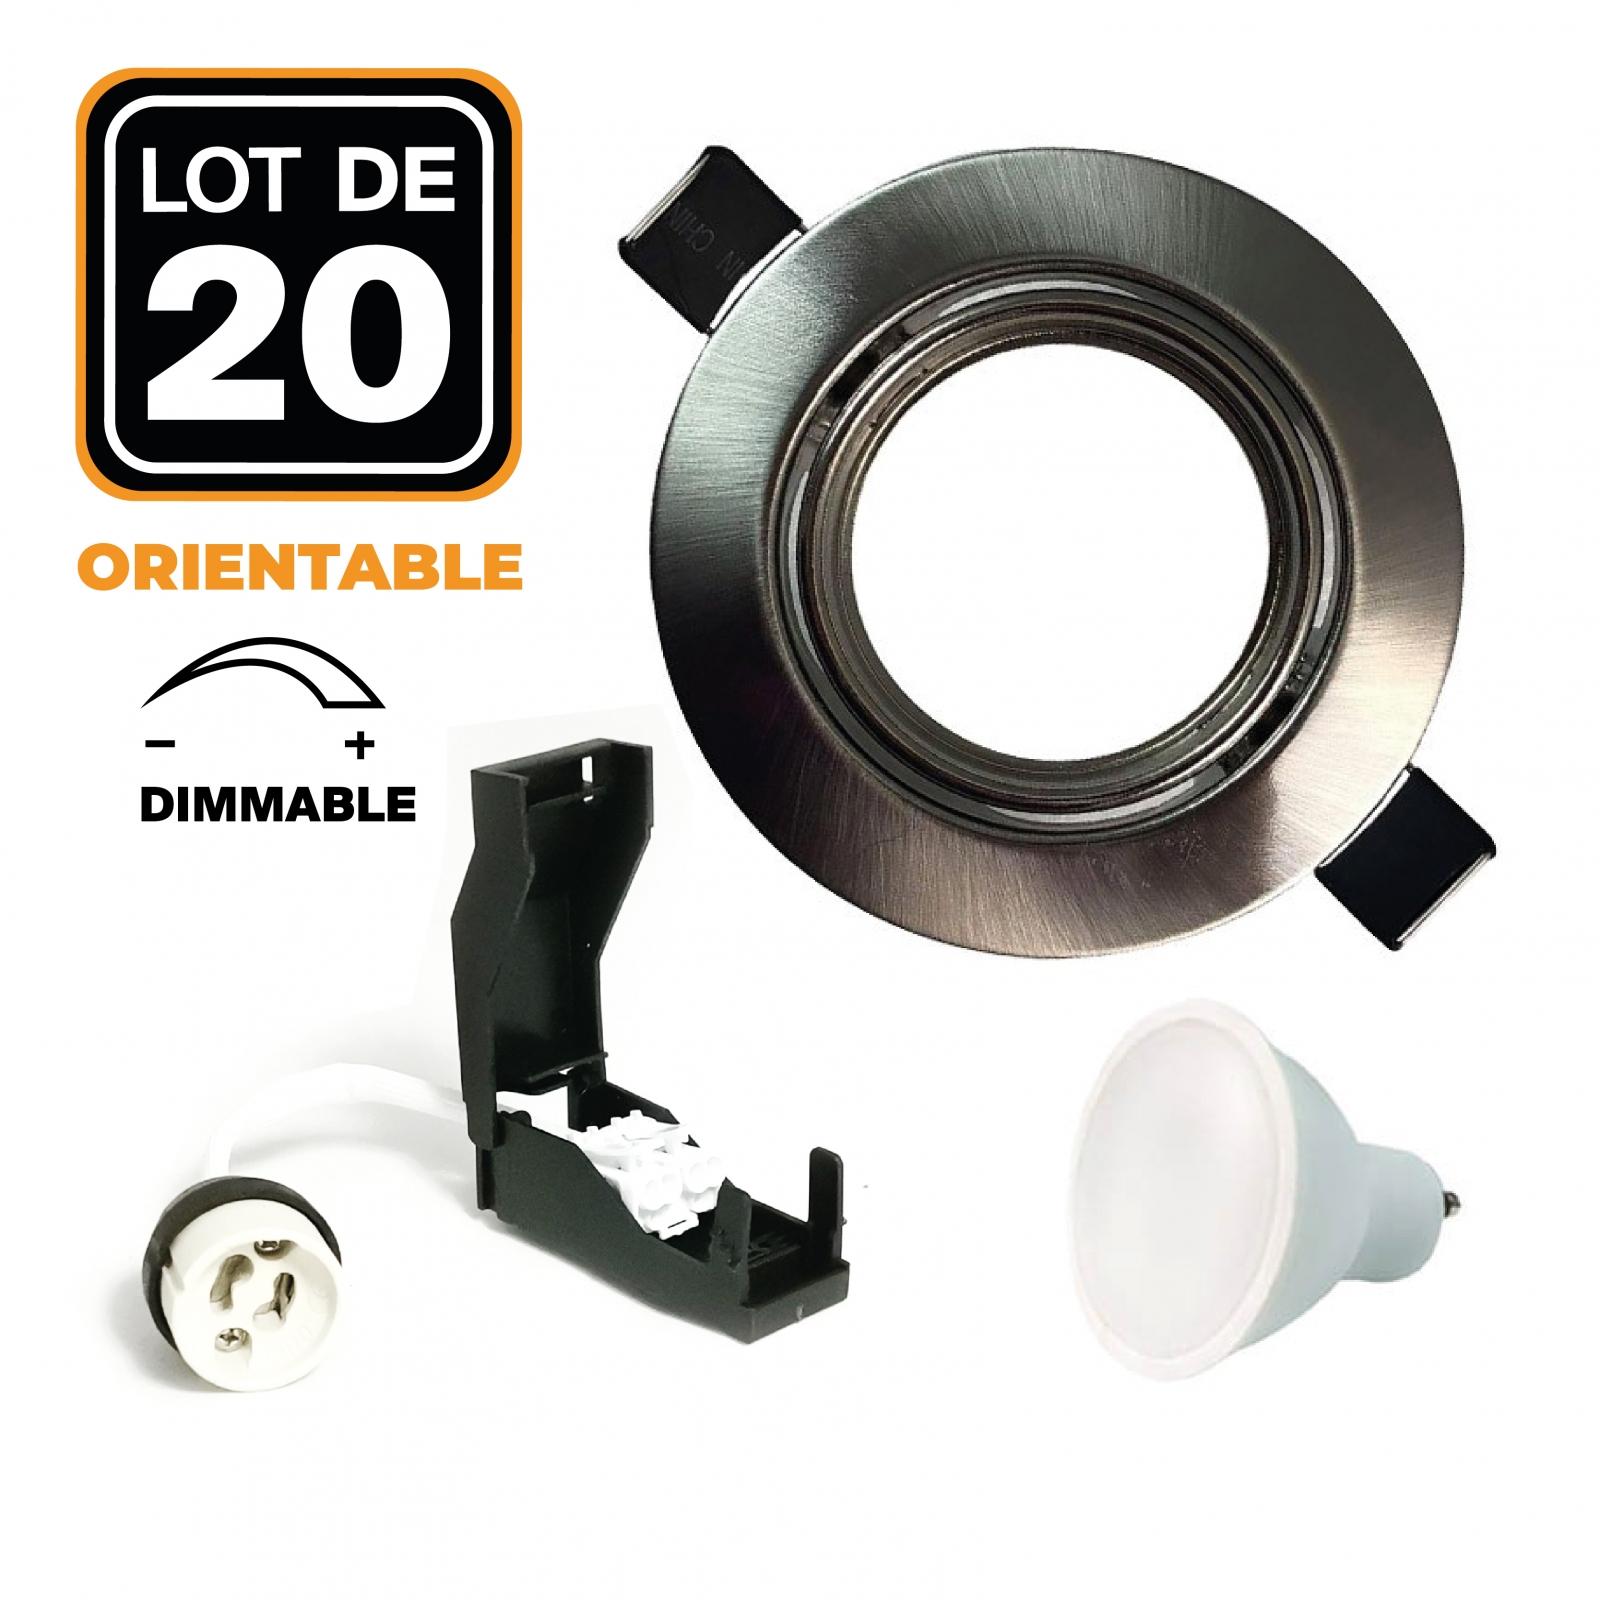 Lot de 20 Spots encastrable orientable ALU BROSSE avec GU10 7W Dimmable